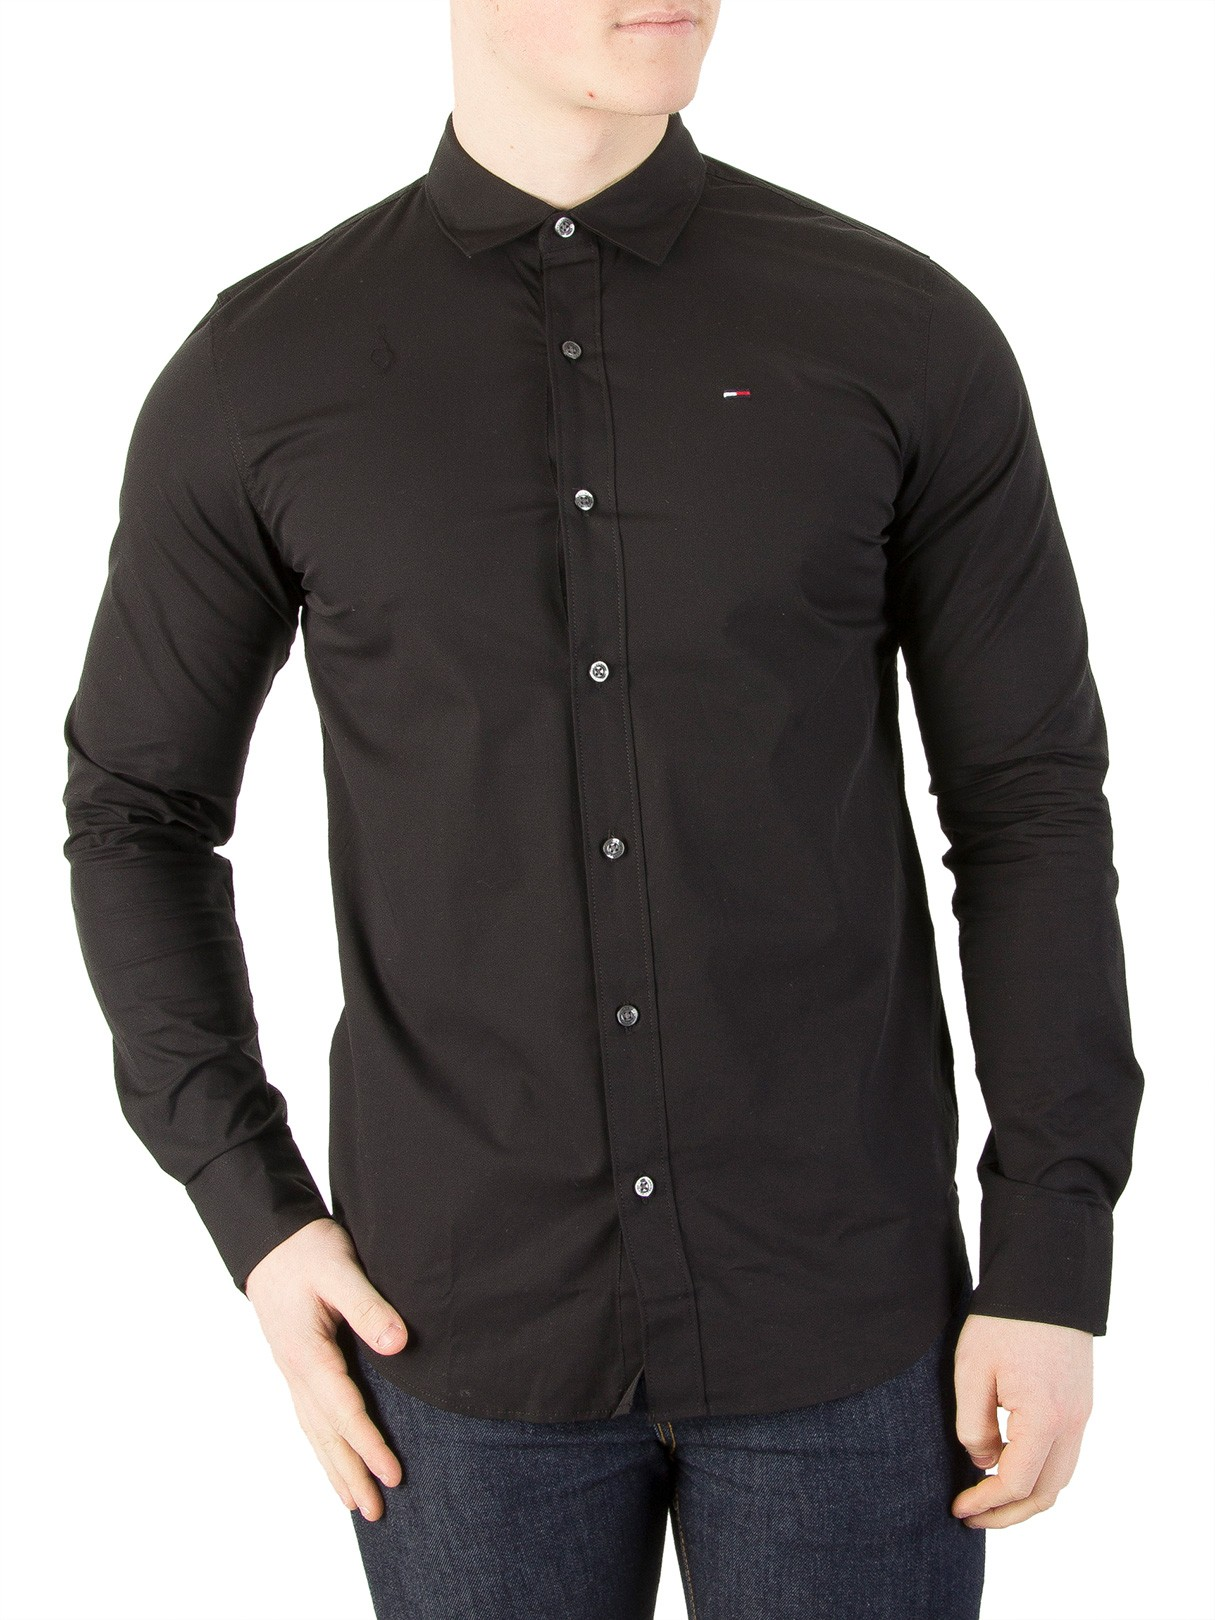 bdefb9c59 Tommy Jeans Tommy Black Original Slim Fit Stretch Shirt | Standout